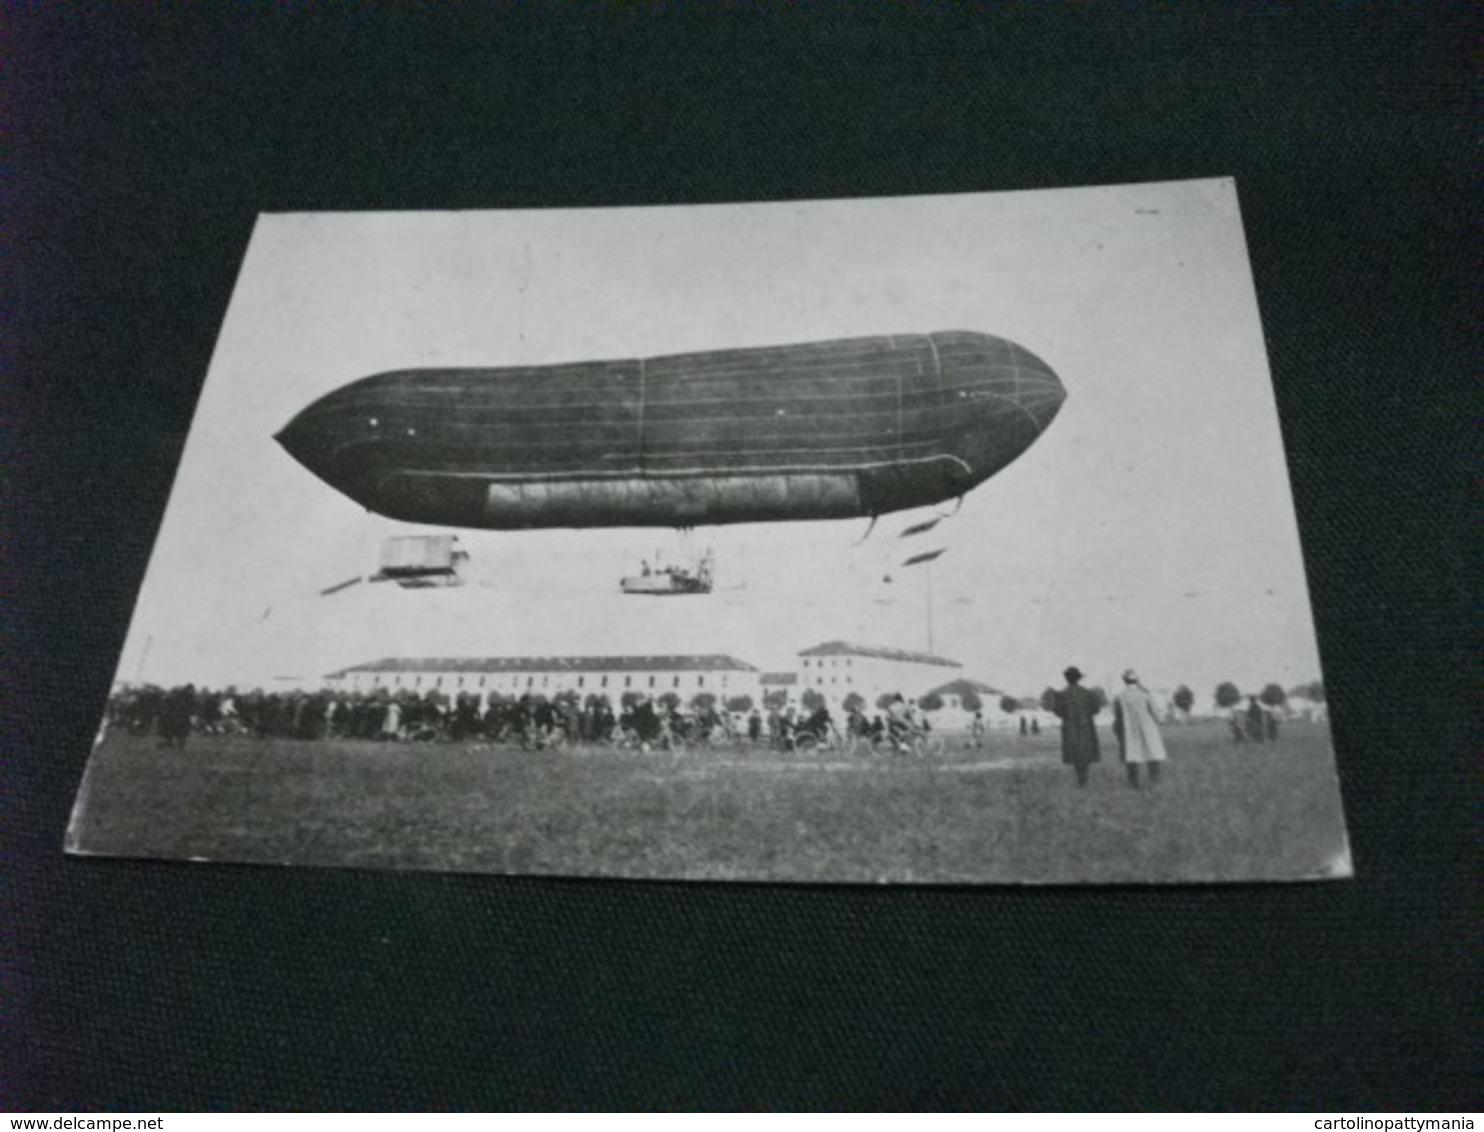 DIRIGIBILE USUELLI 1909 TIPO FLOSCIO LUNGO 51 METRI CICLISTI - Dirigibili